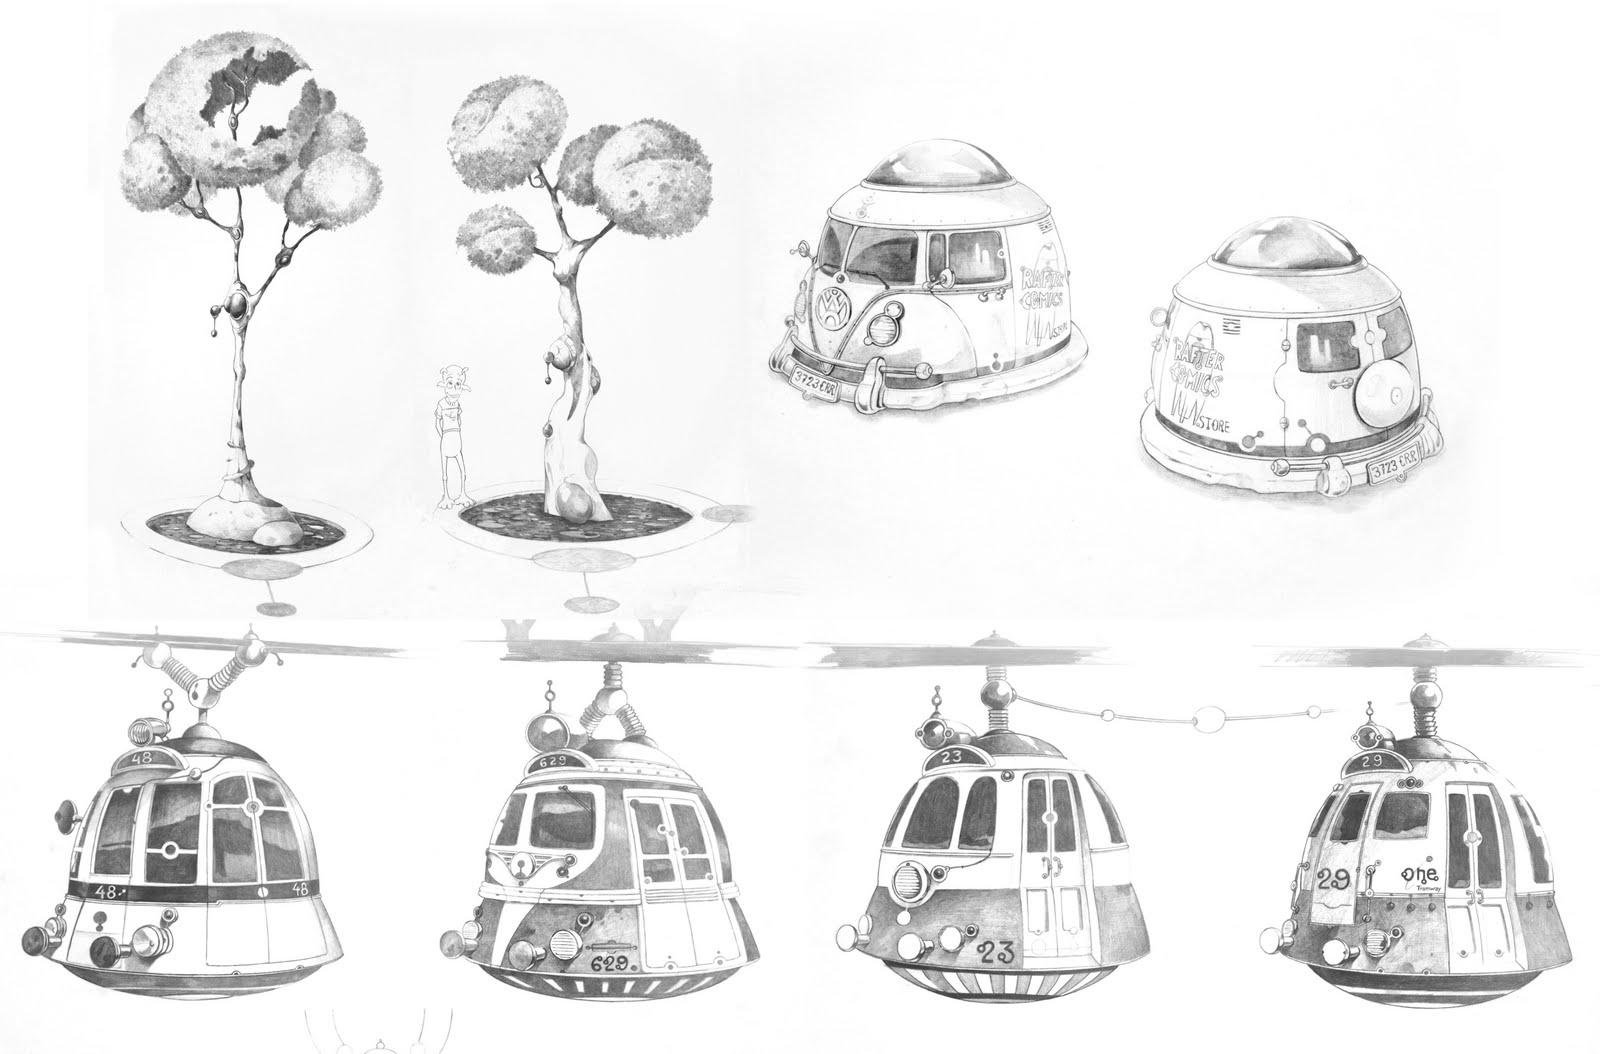 nine planets drawing - photo #41